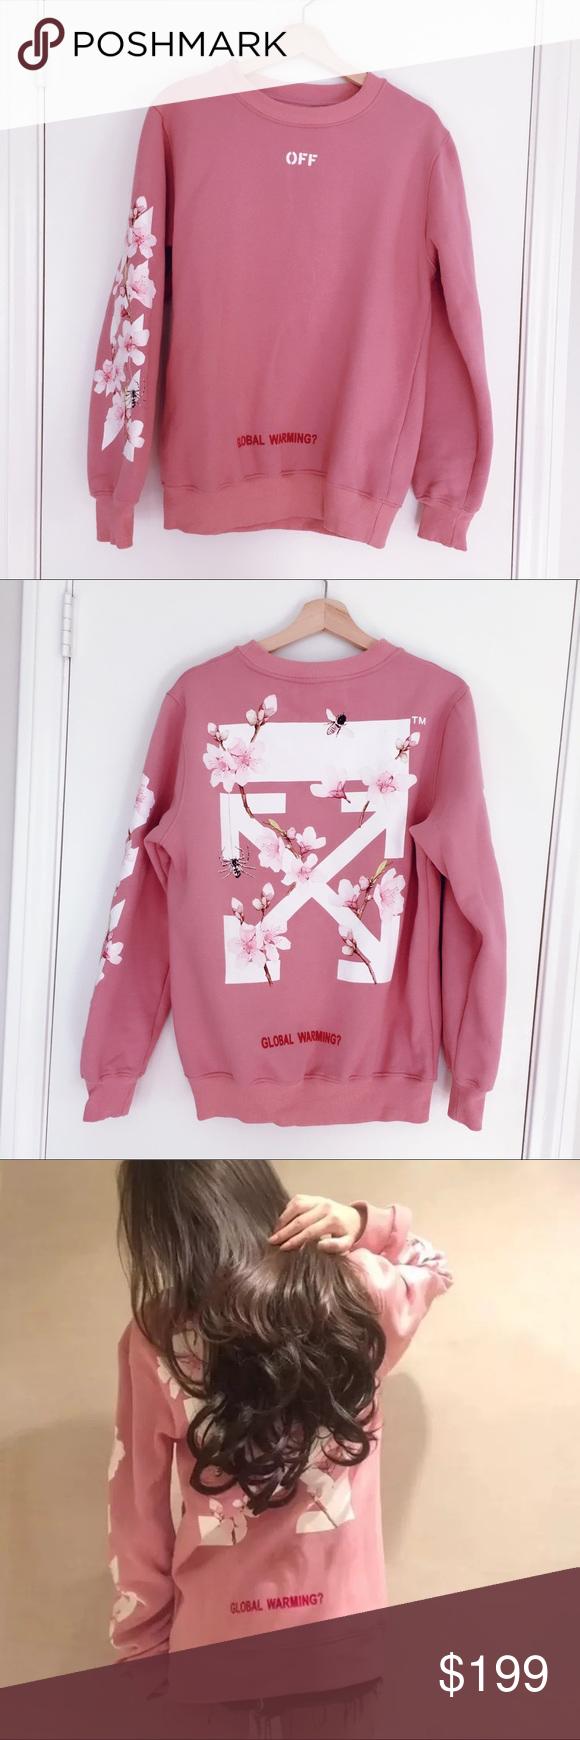 Brand New Off White Cherry Flower Sweatshirtow17fw White Cherries Pink Sweatshirt Cherry Flower [ 1740 x 580 Pixel ]